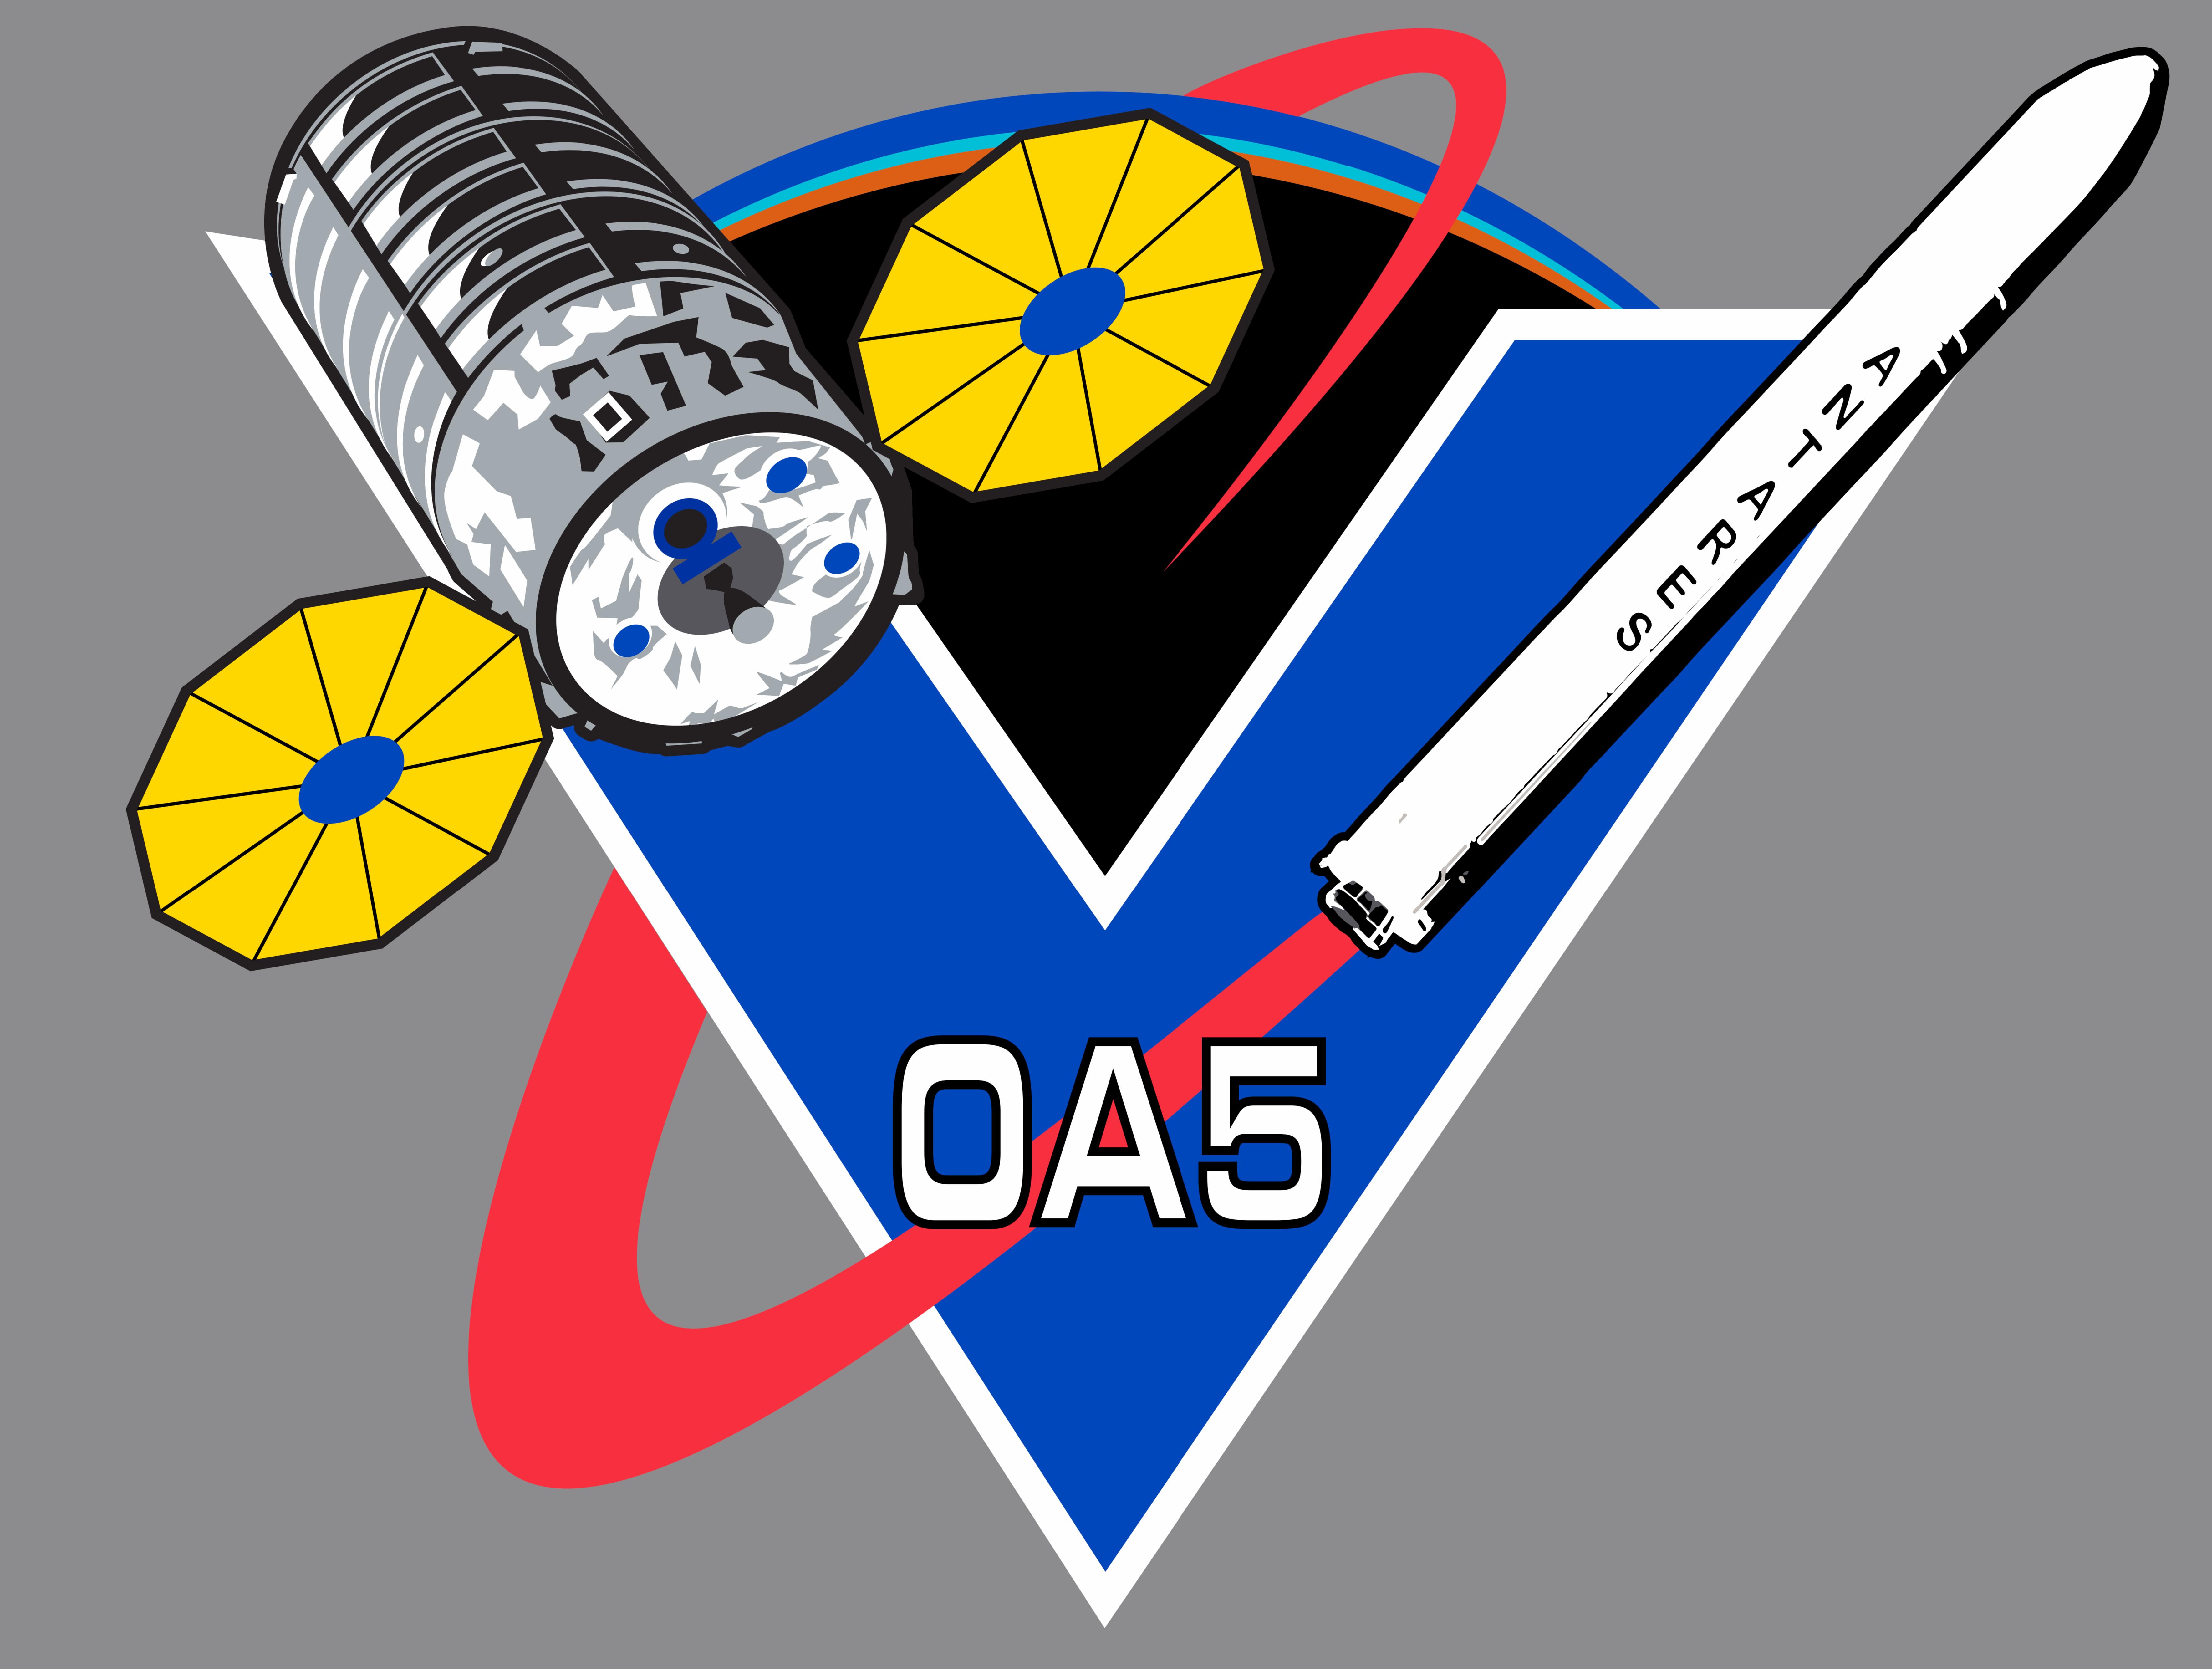 Cygnus_OA-5_Patch